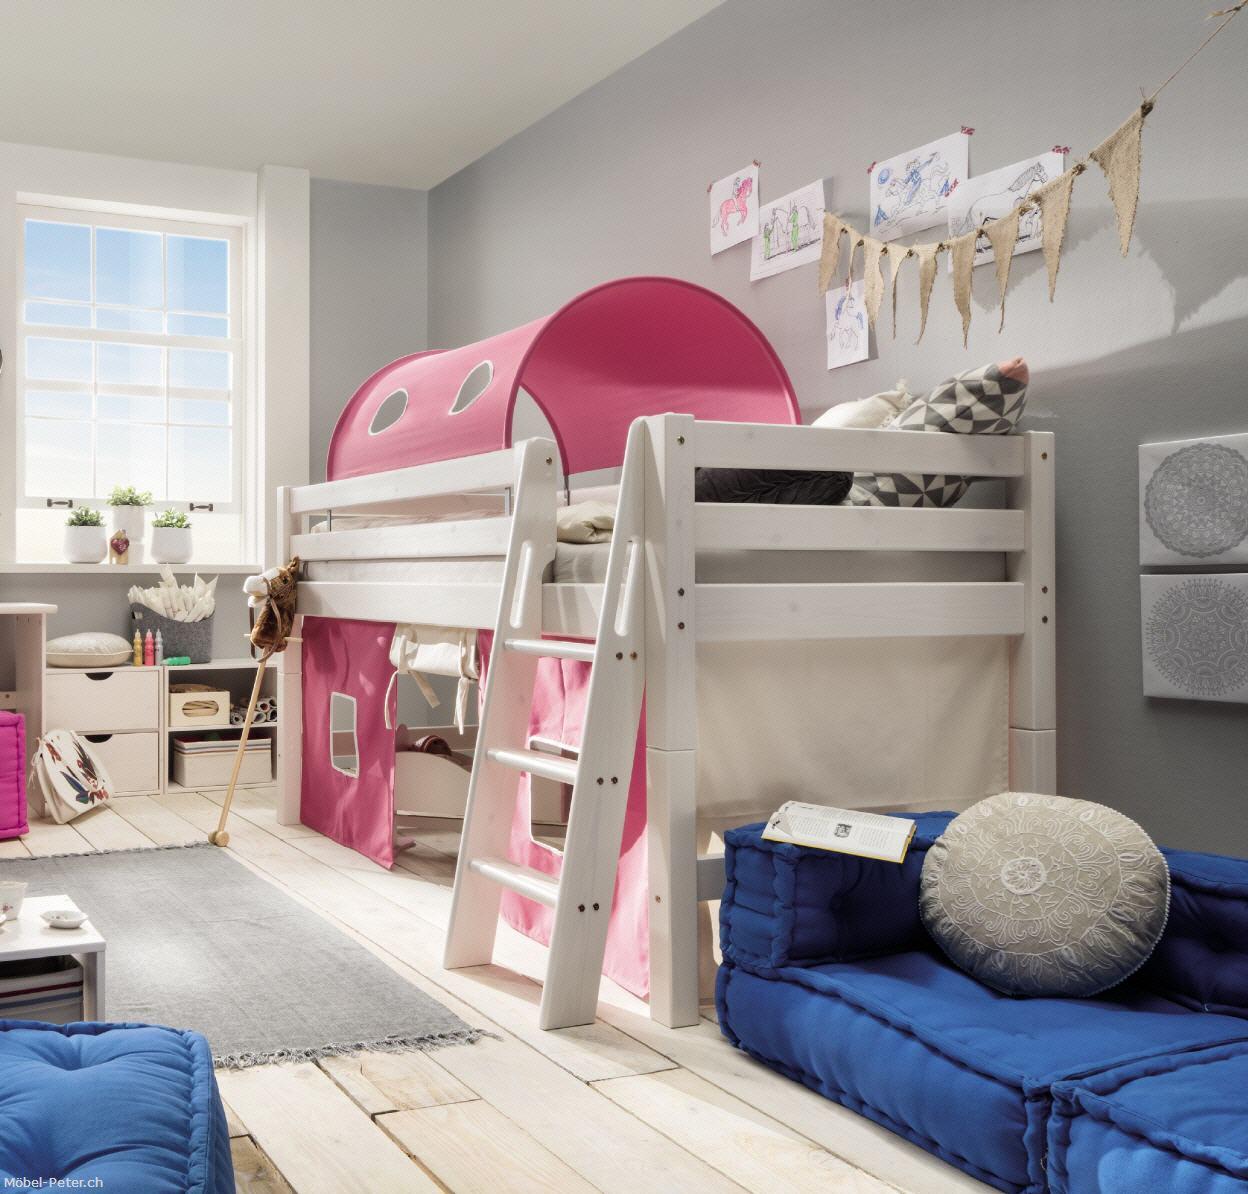 Full Size of Kinderbett Mädchen Mbel Peterch Bett Betten Wohnzimmer Kinderbett Mädchen